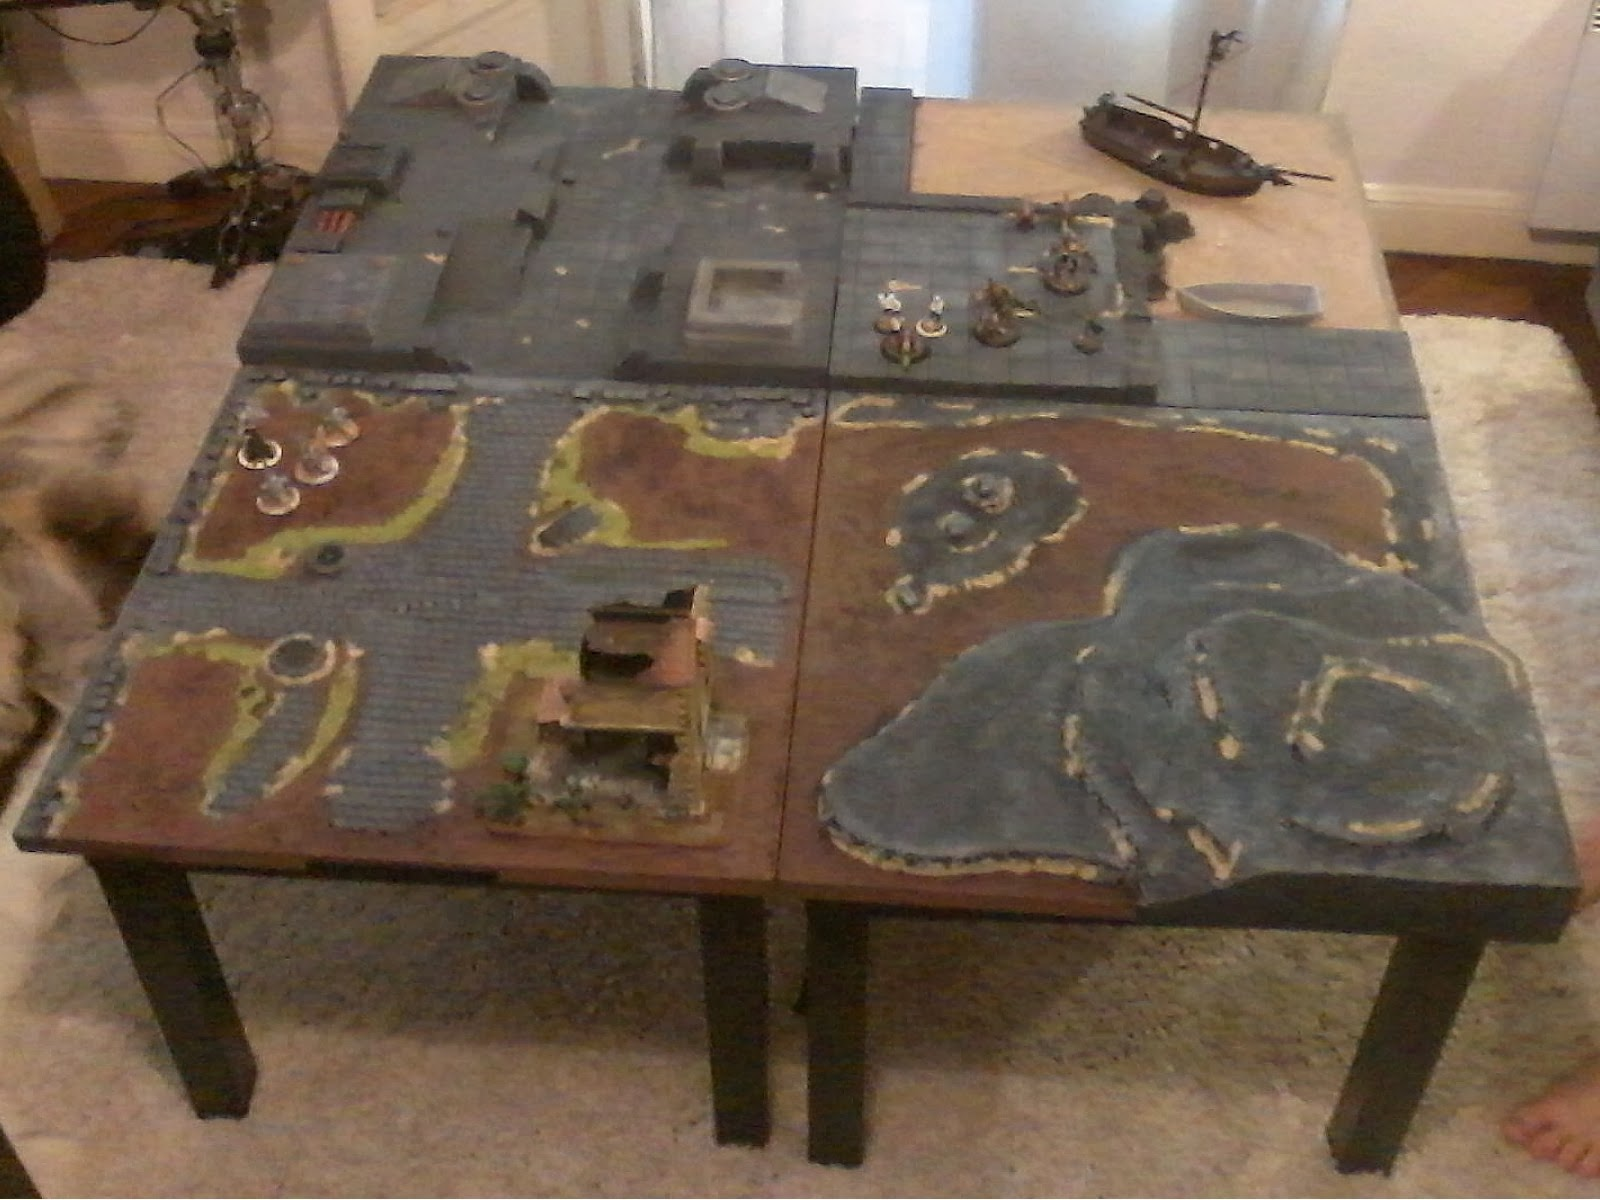 Gws games of war studio by jck octobre 2013 - Table modulable ikea ...